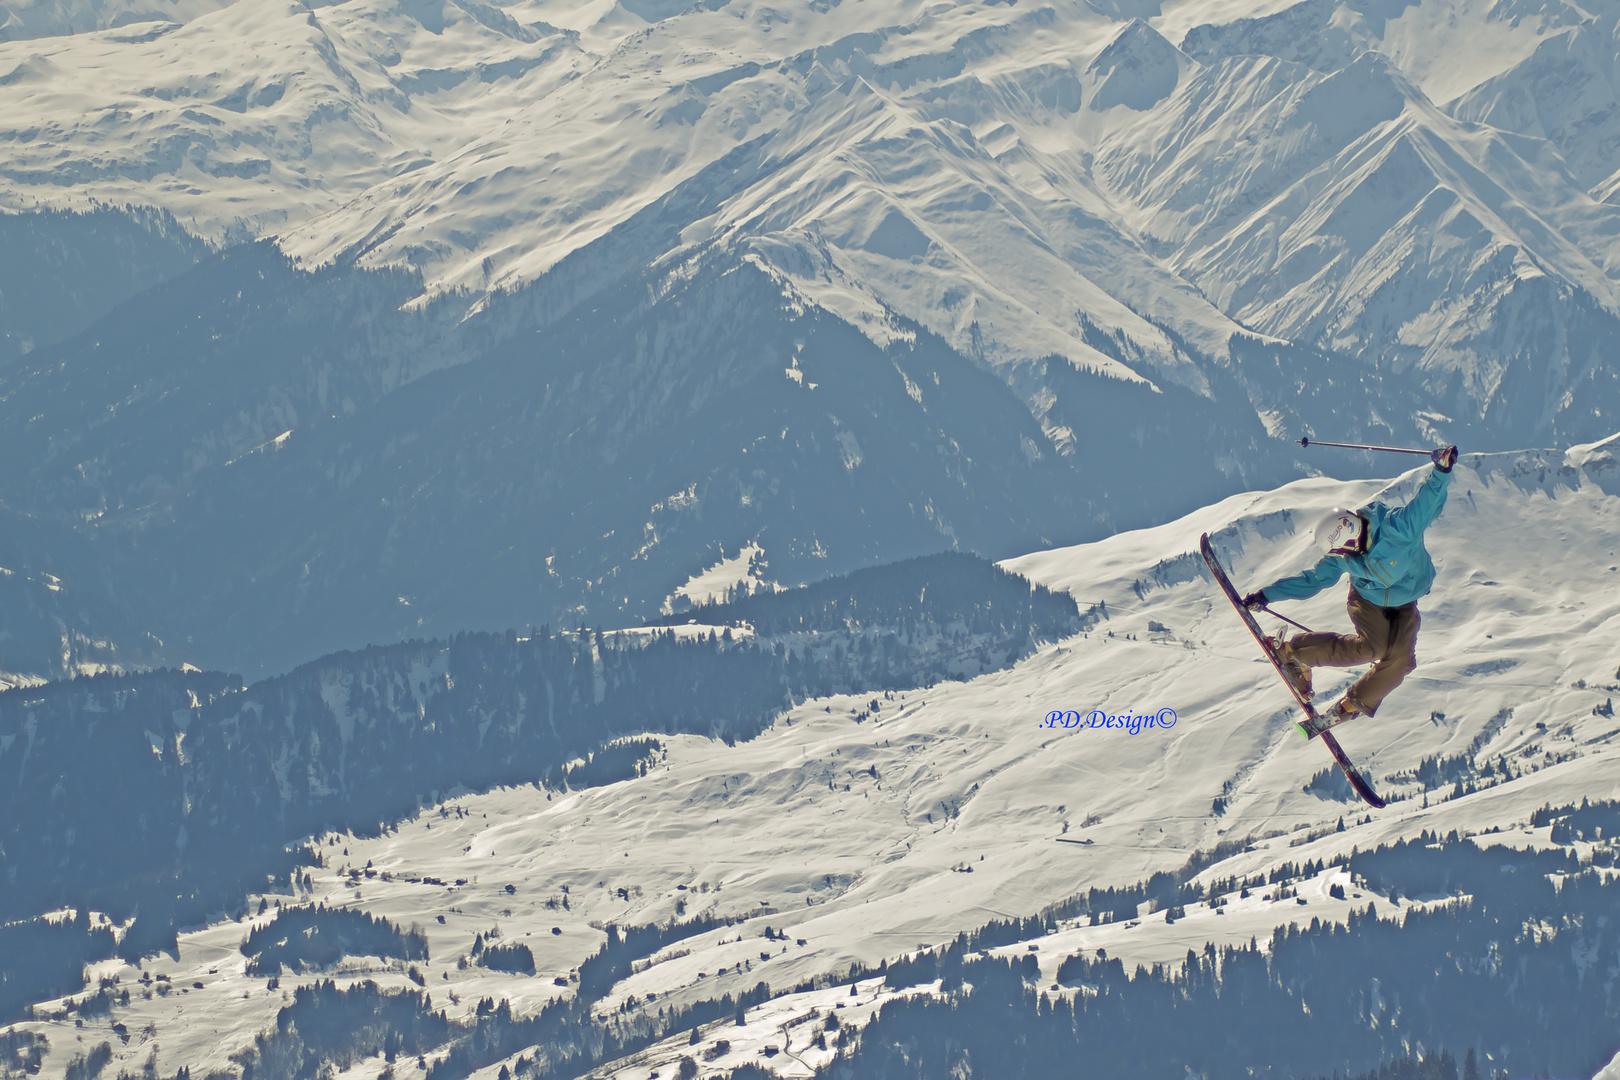 European Freeskiing Contest Laax 2014